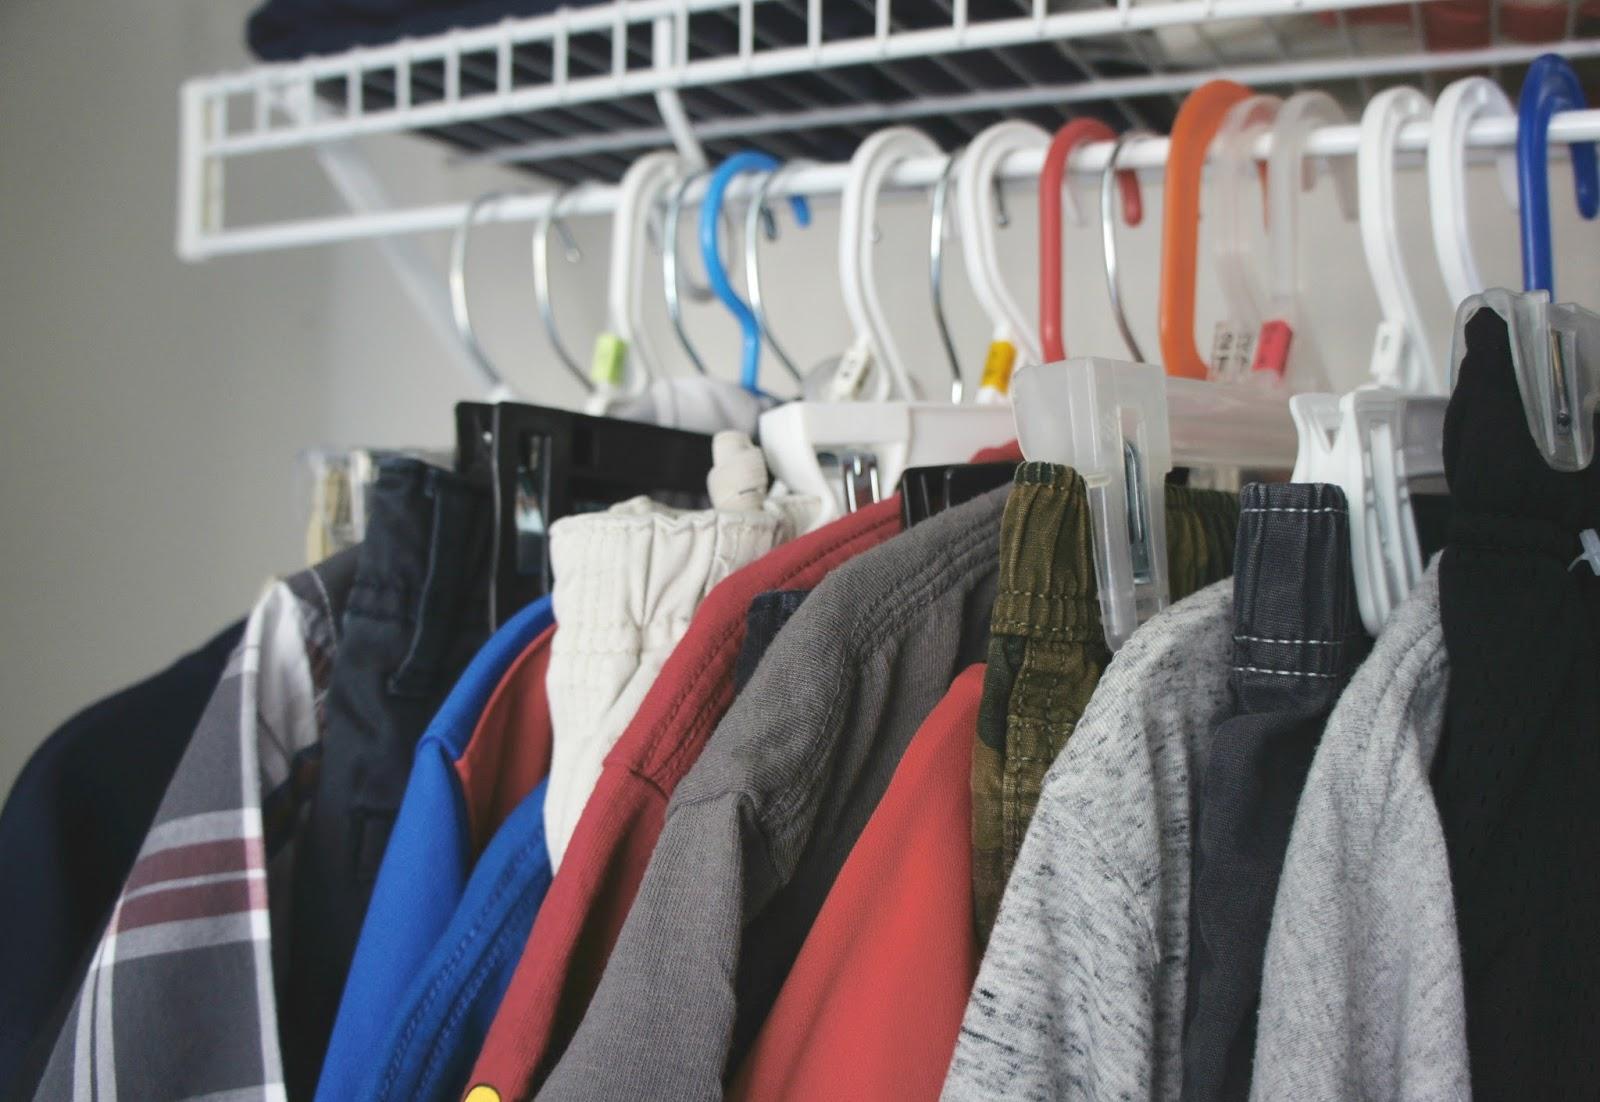 Tips for creating an easy school routine - Kids Clothes Organization - Jimmy Dean breakfast sandwiches #FuelforSchool